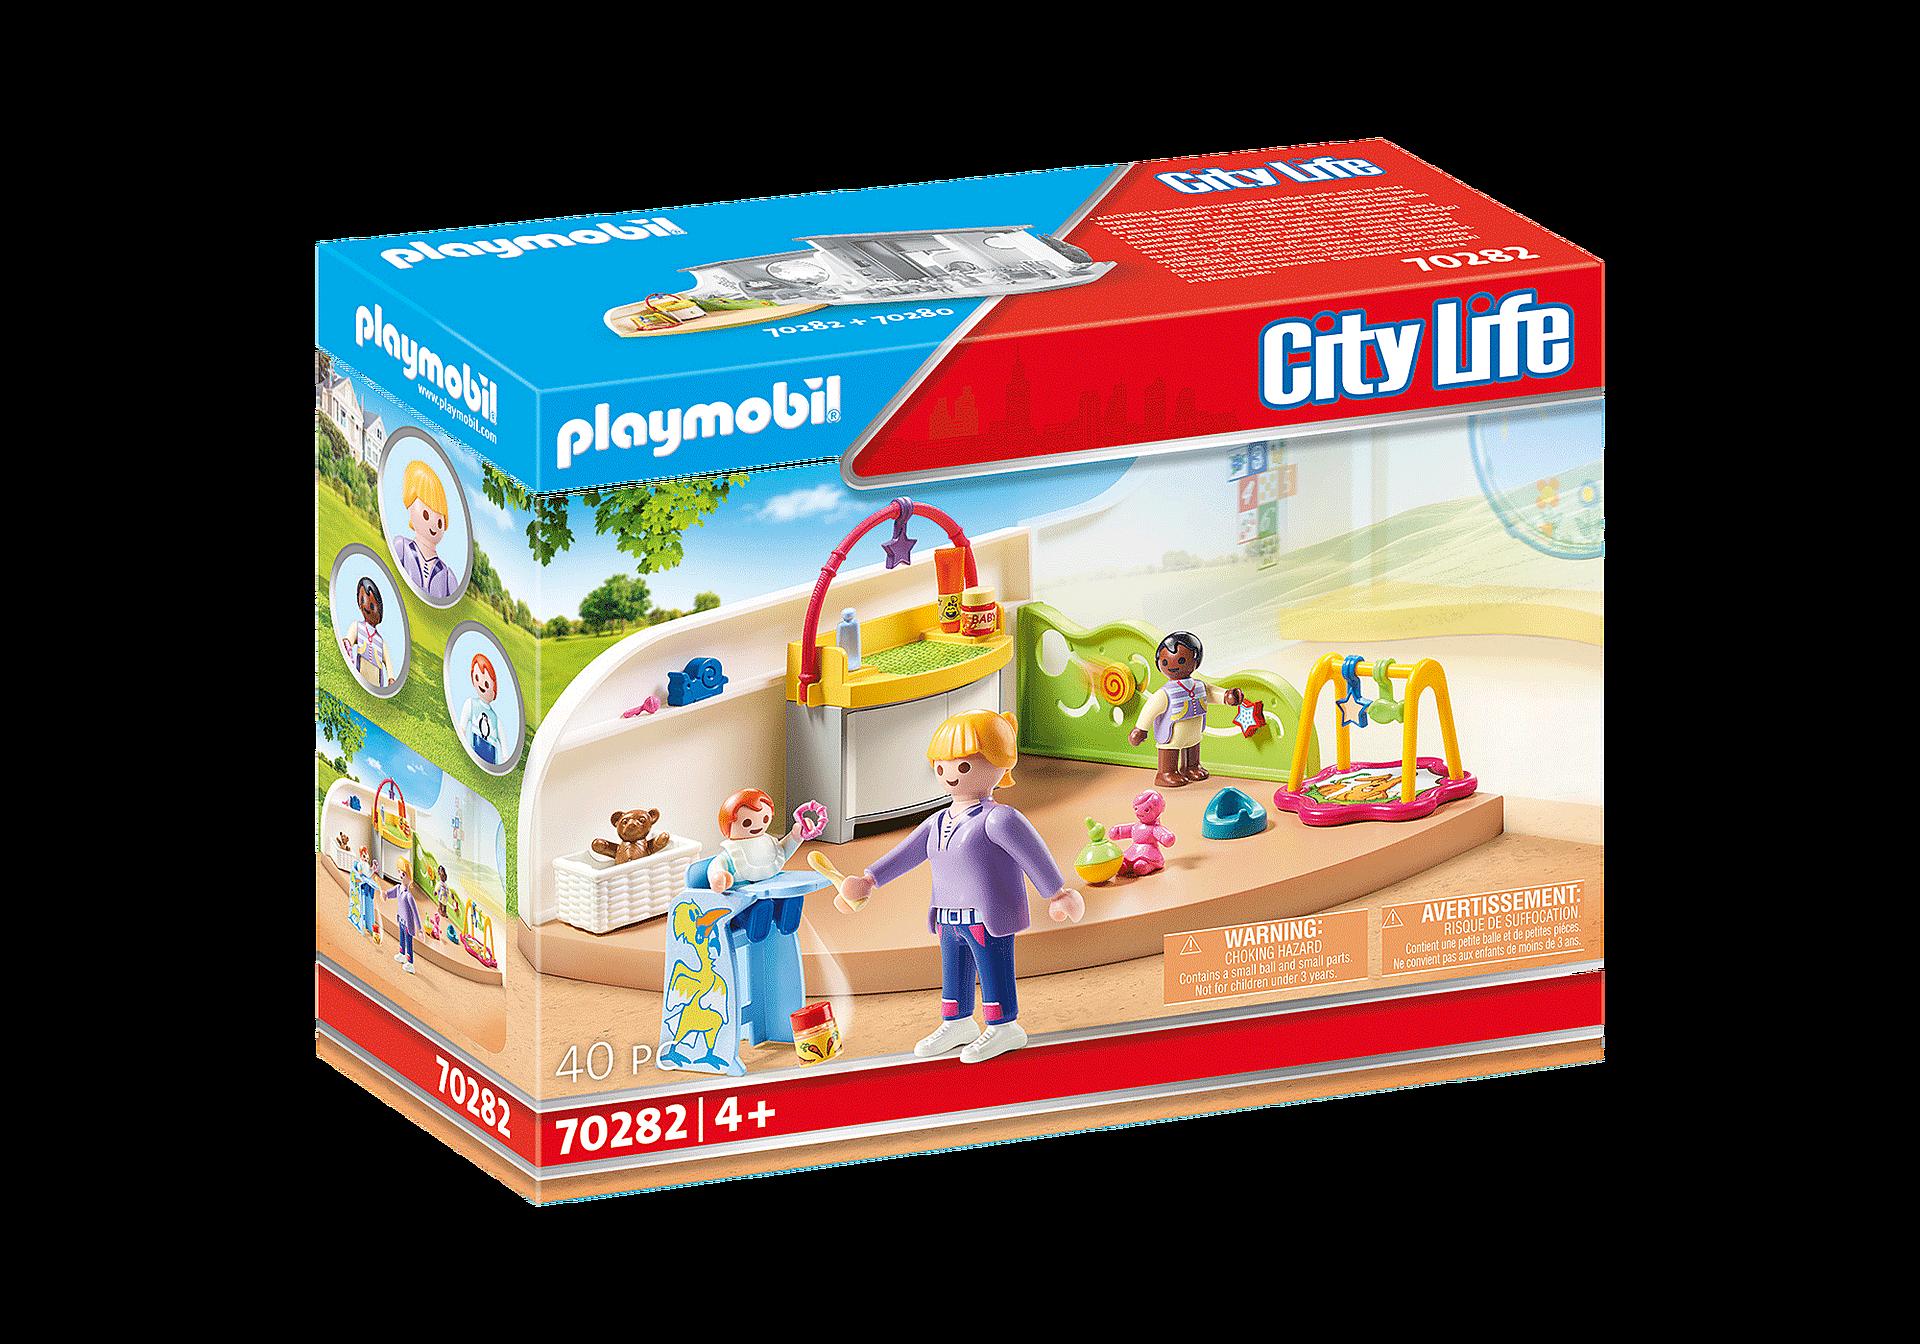 Playmobil - Toddler Room (70282)